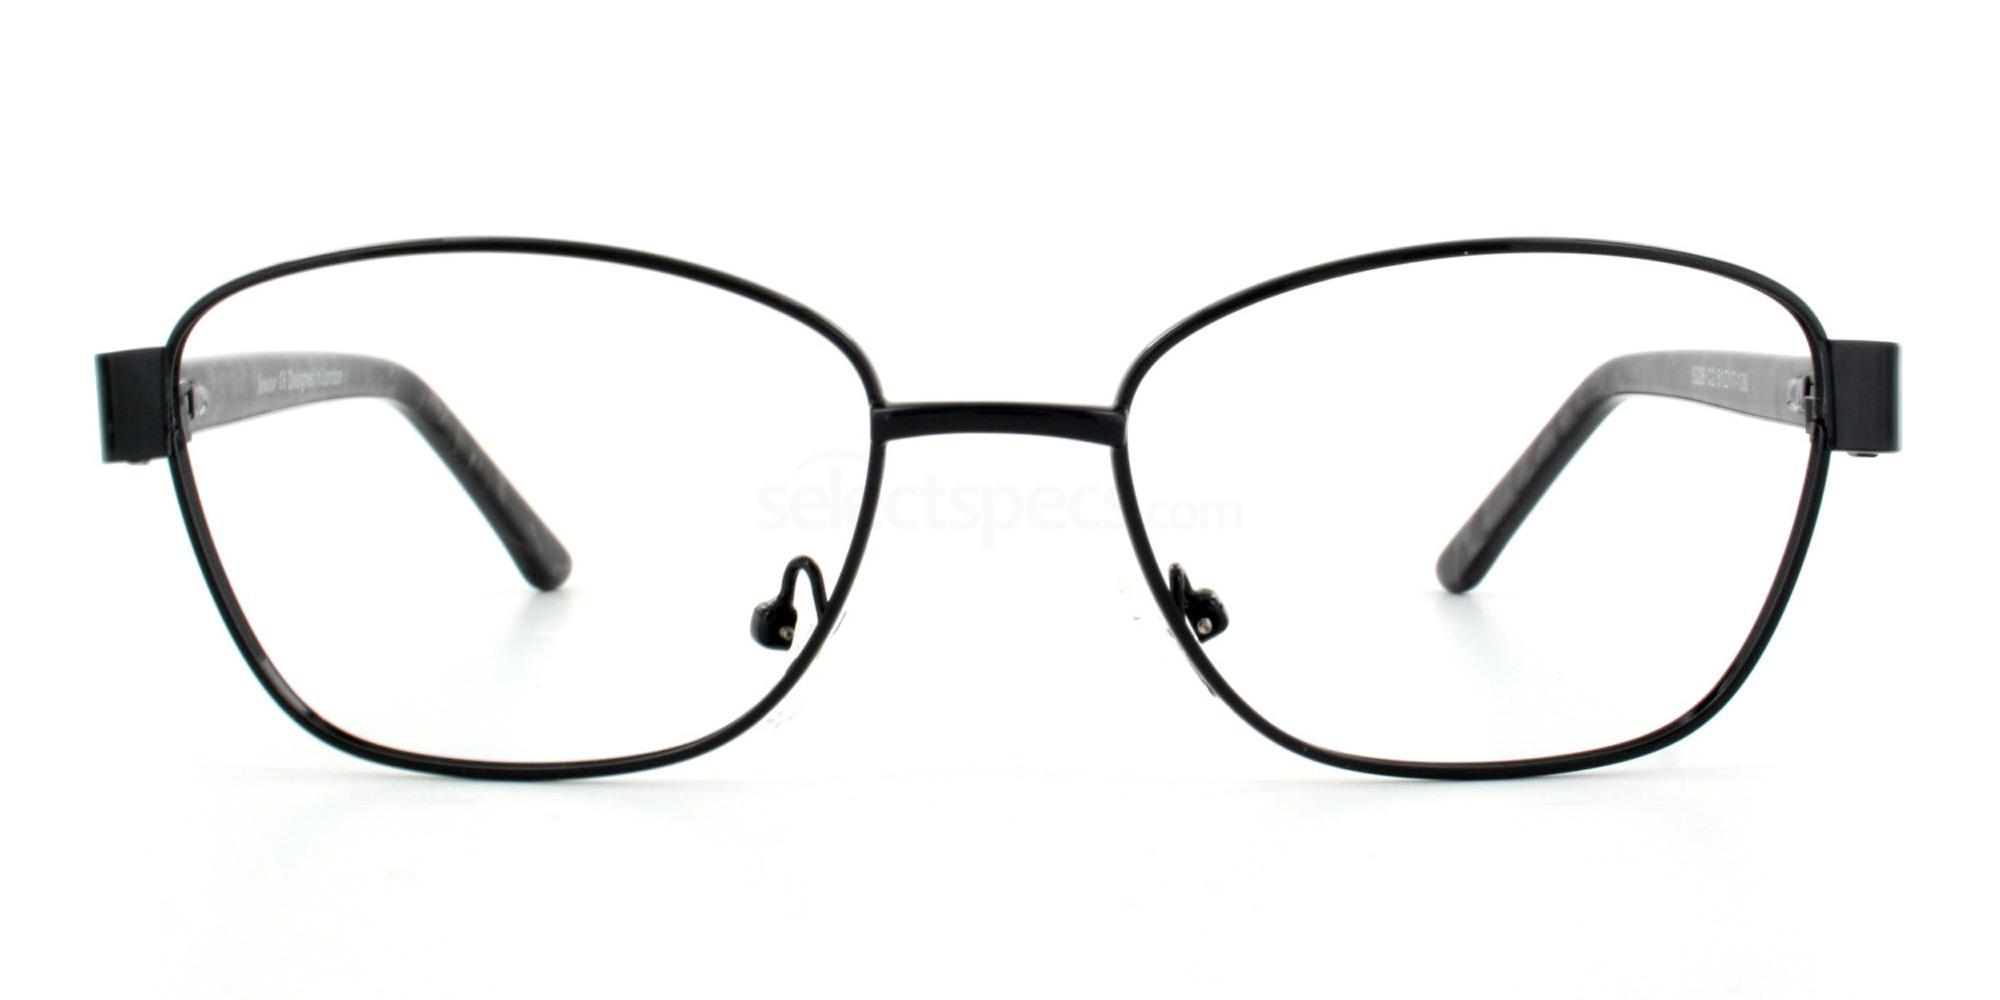 C2 SENATOR 228 Glasses, Senator